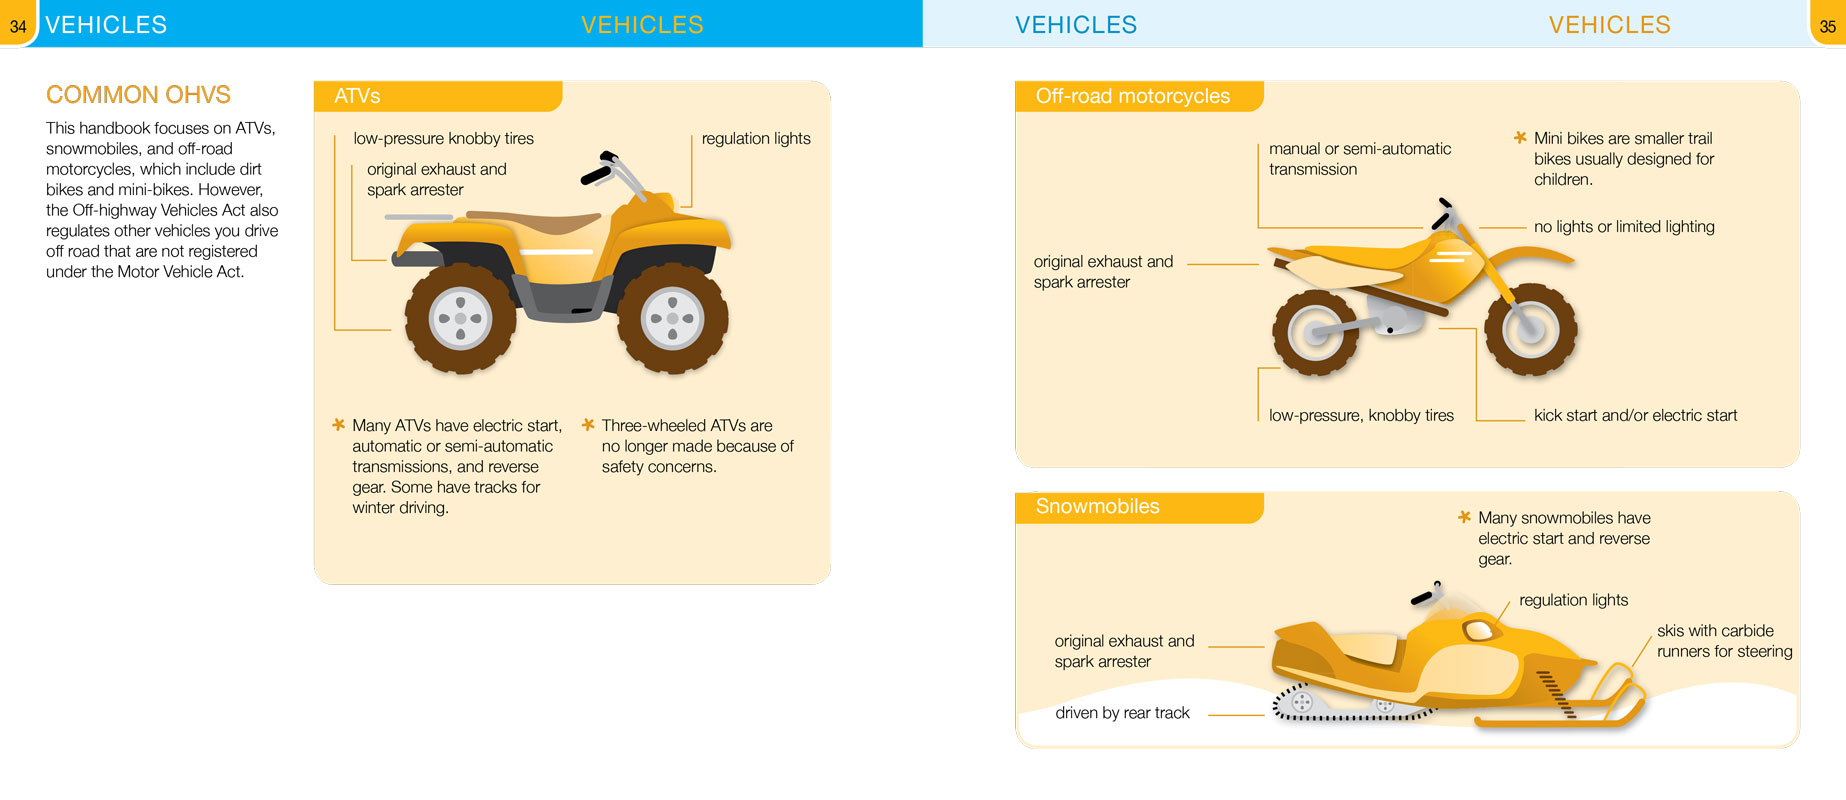 OHV Vehicles